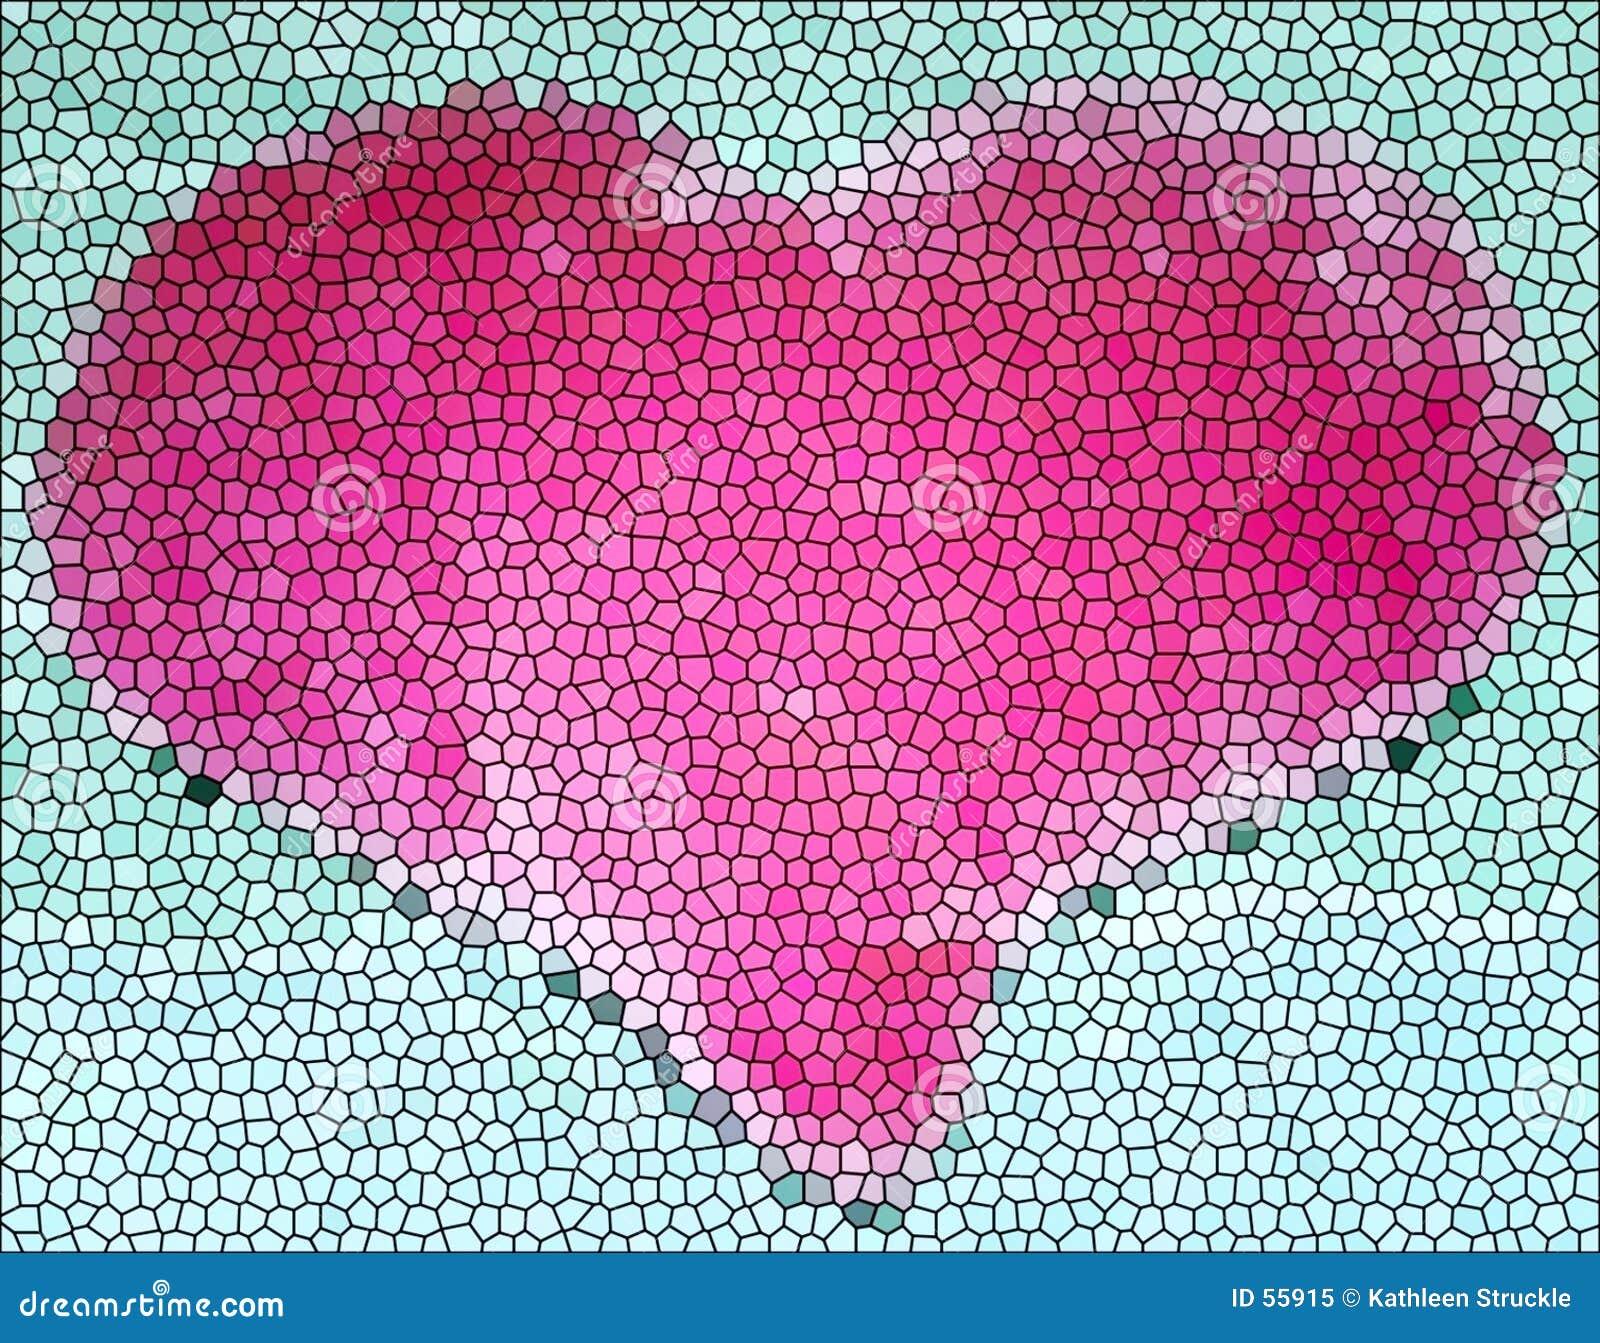 Szklane serce oznaczane